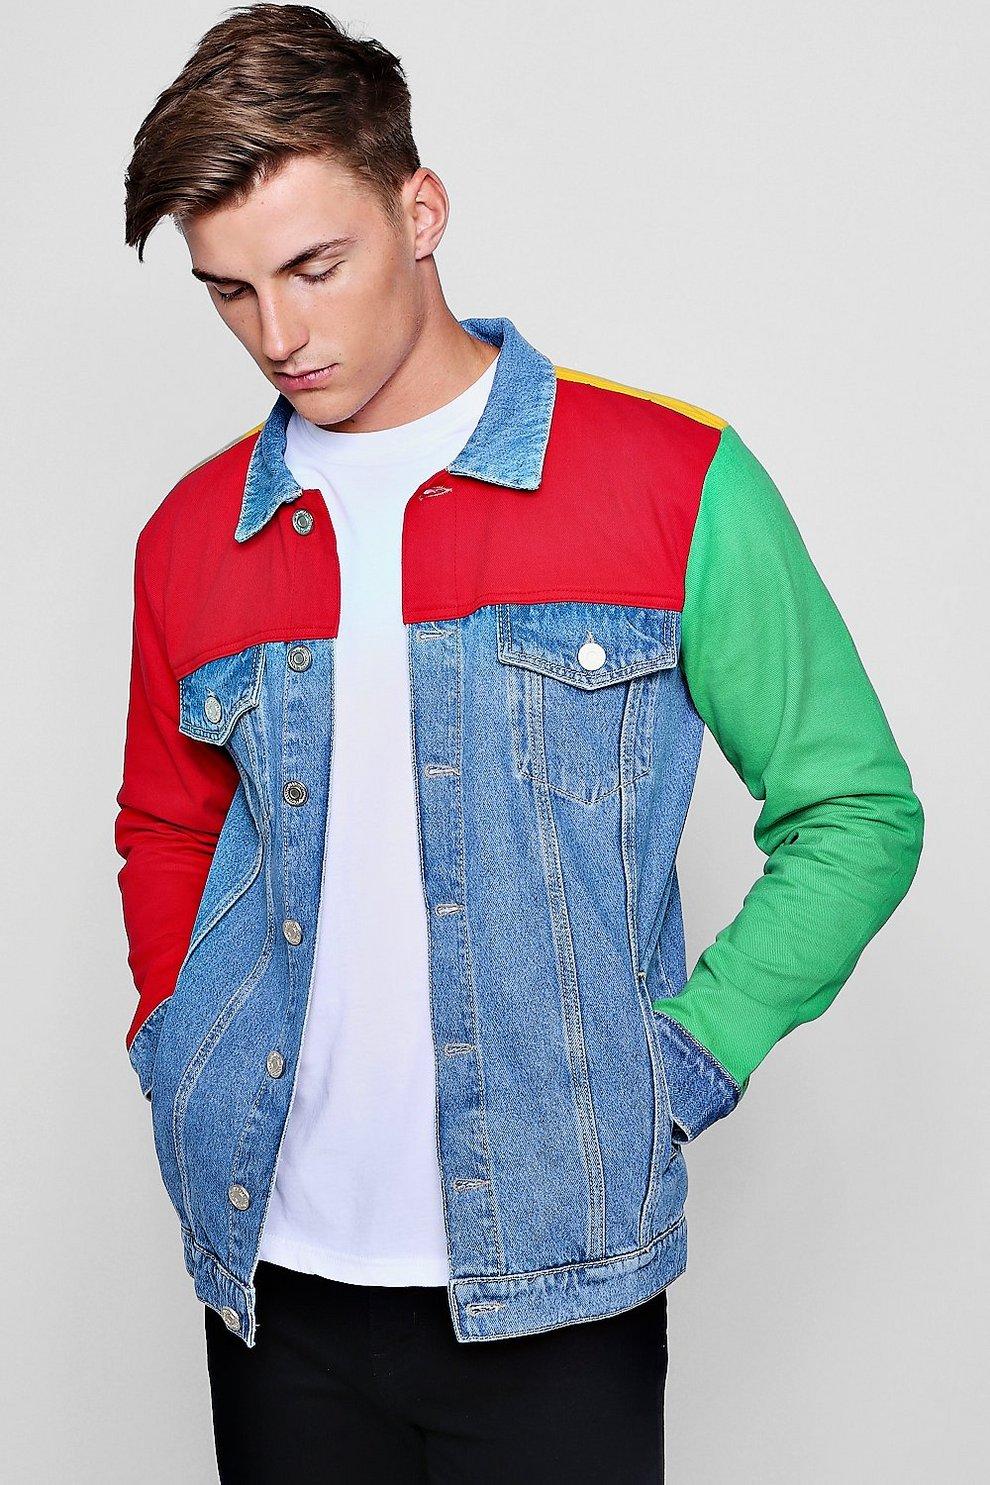 526bbcdf3334e Colour Block Denim Jacket